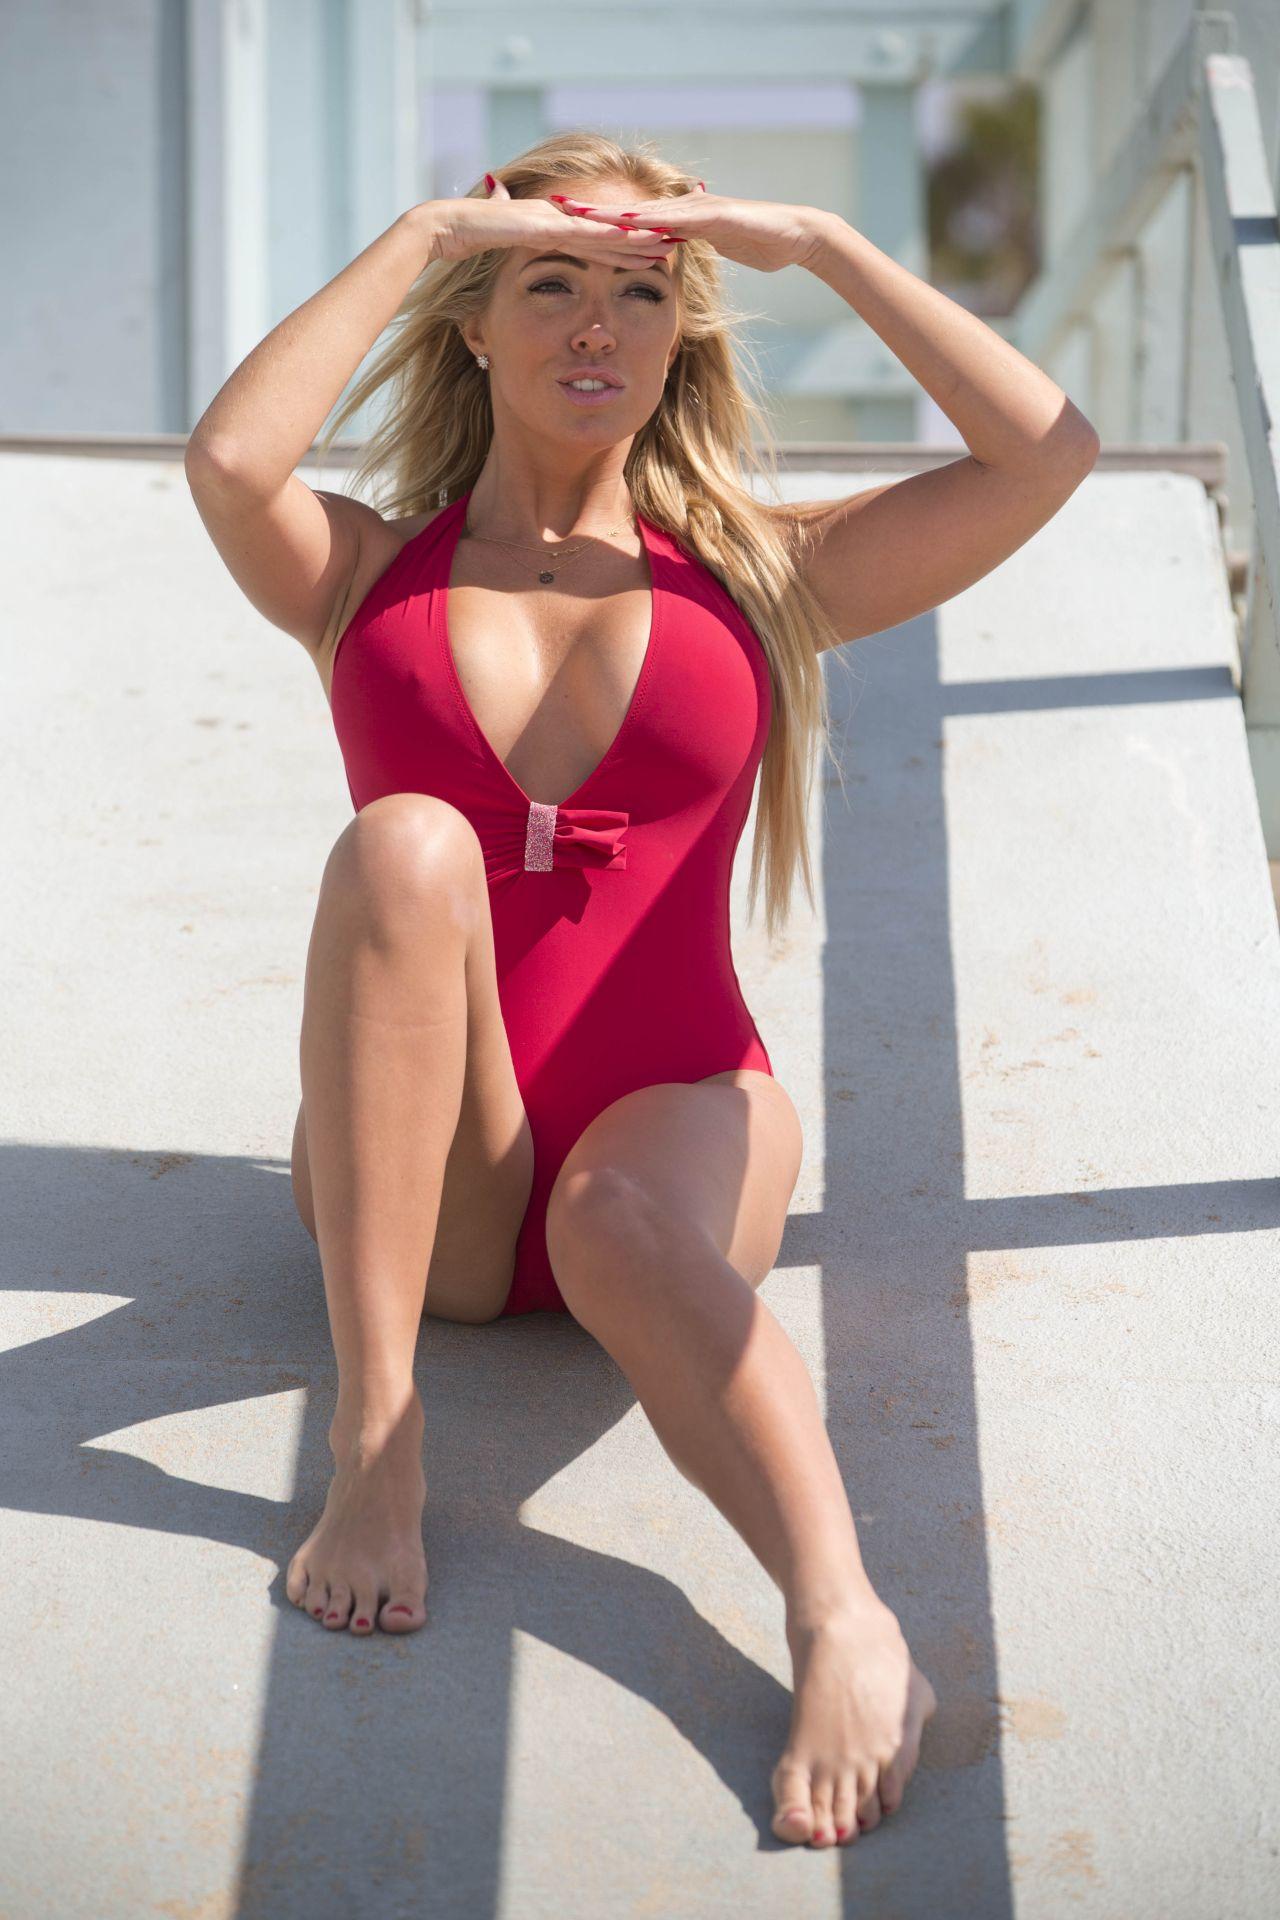 Bikini Aisleyne Horgan-Wallace naked (89 foto and video), Ass, Hot, Twitter, butt 2015